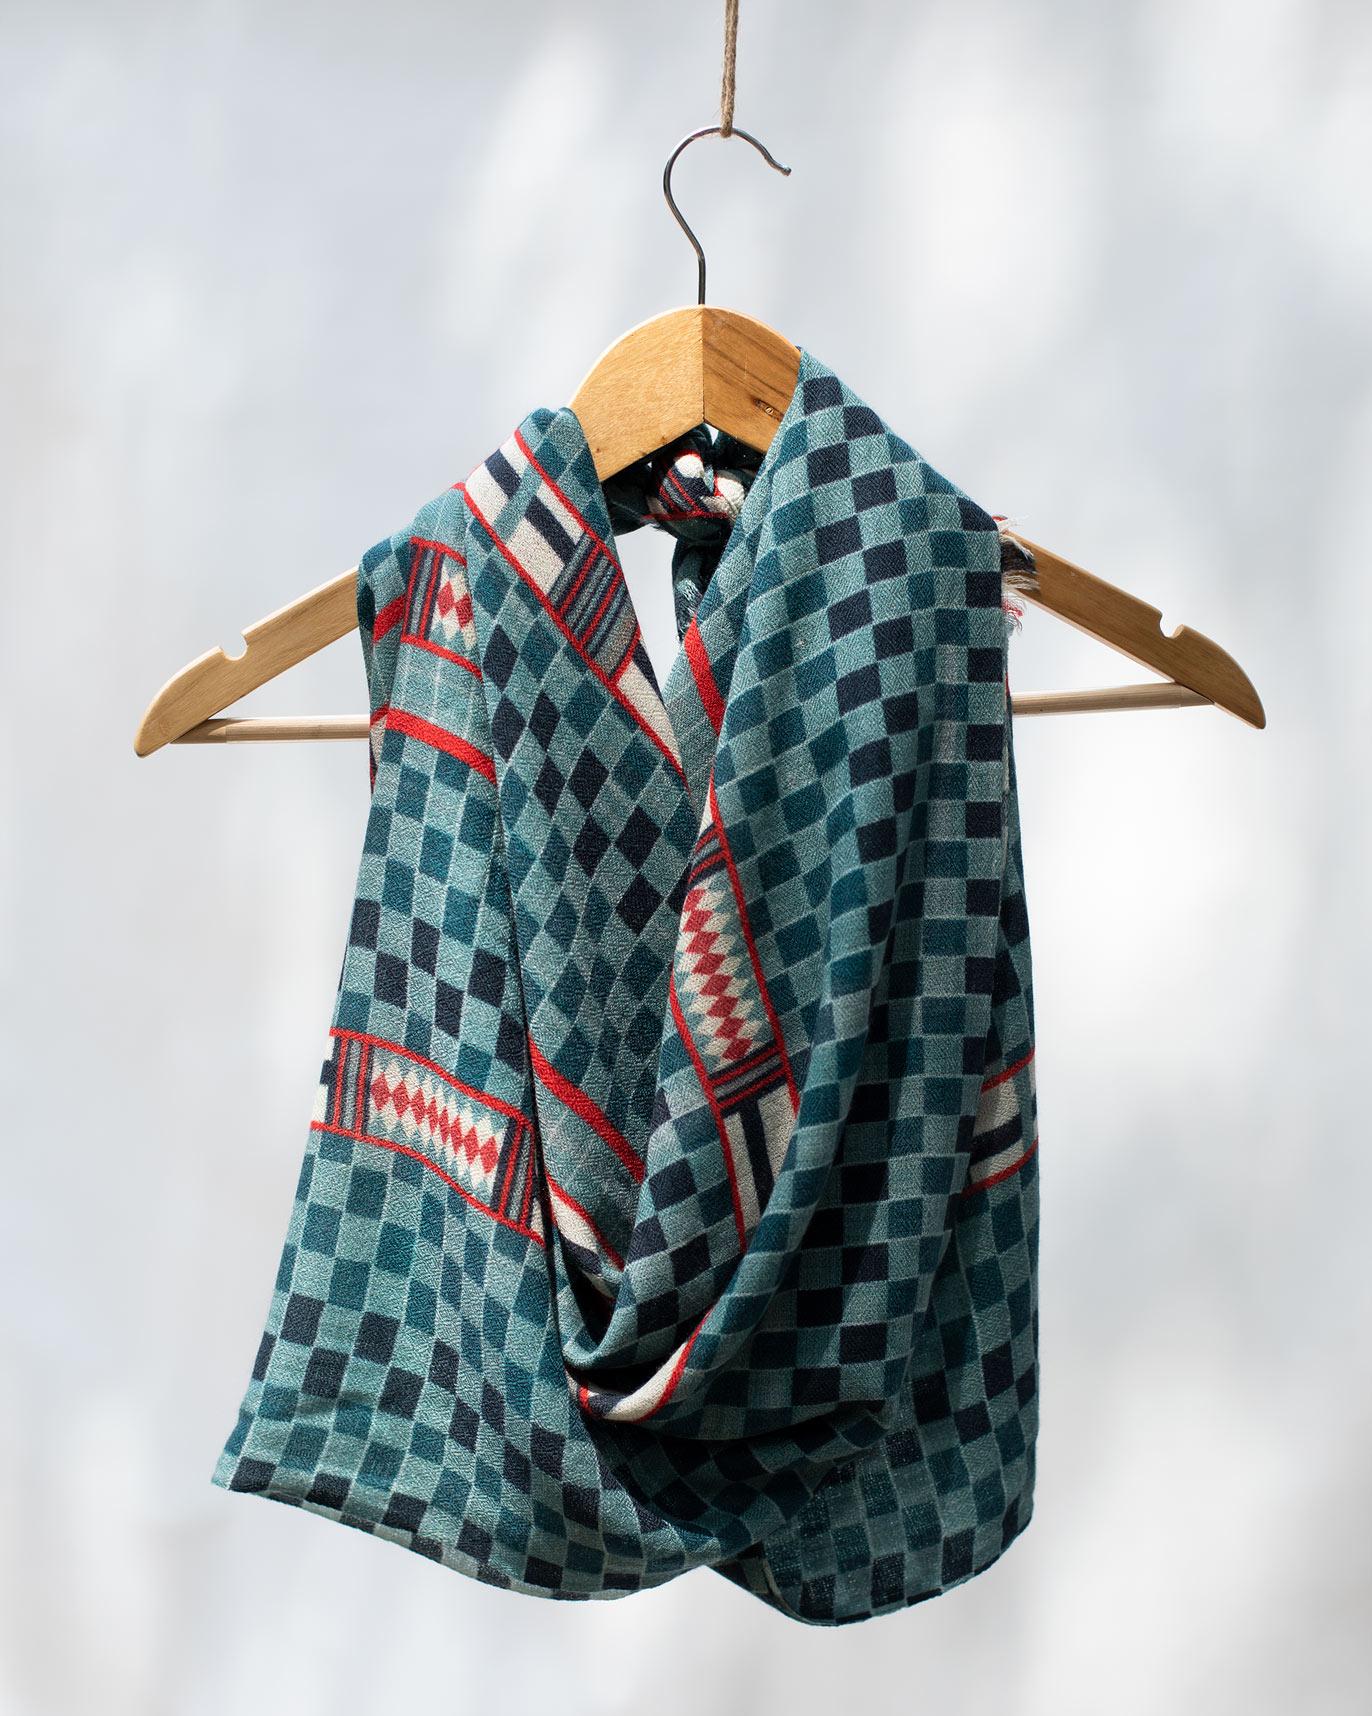 Woolen scarf winter wardrobe